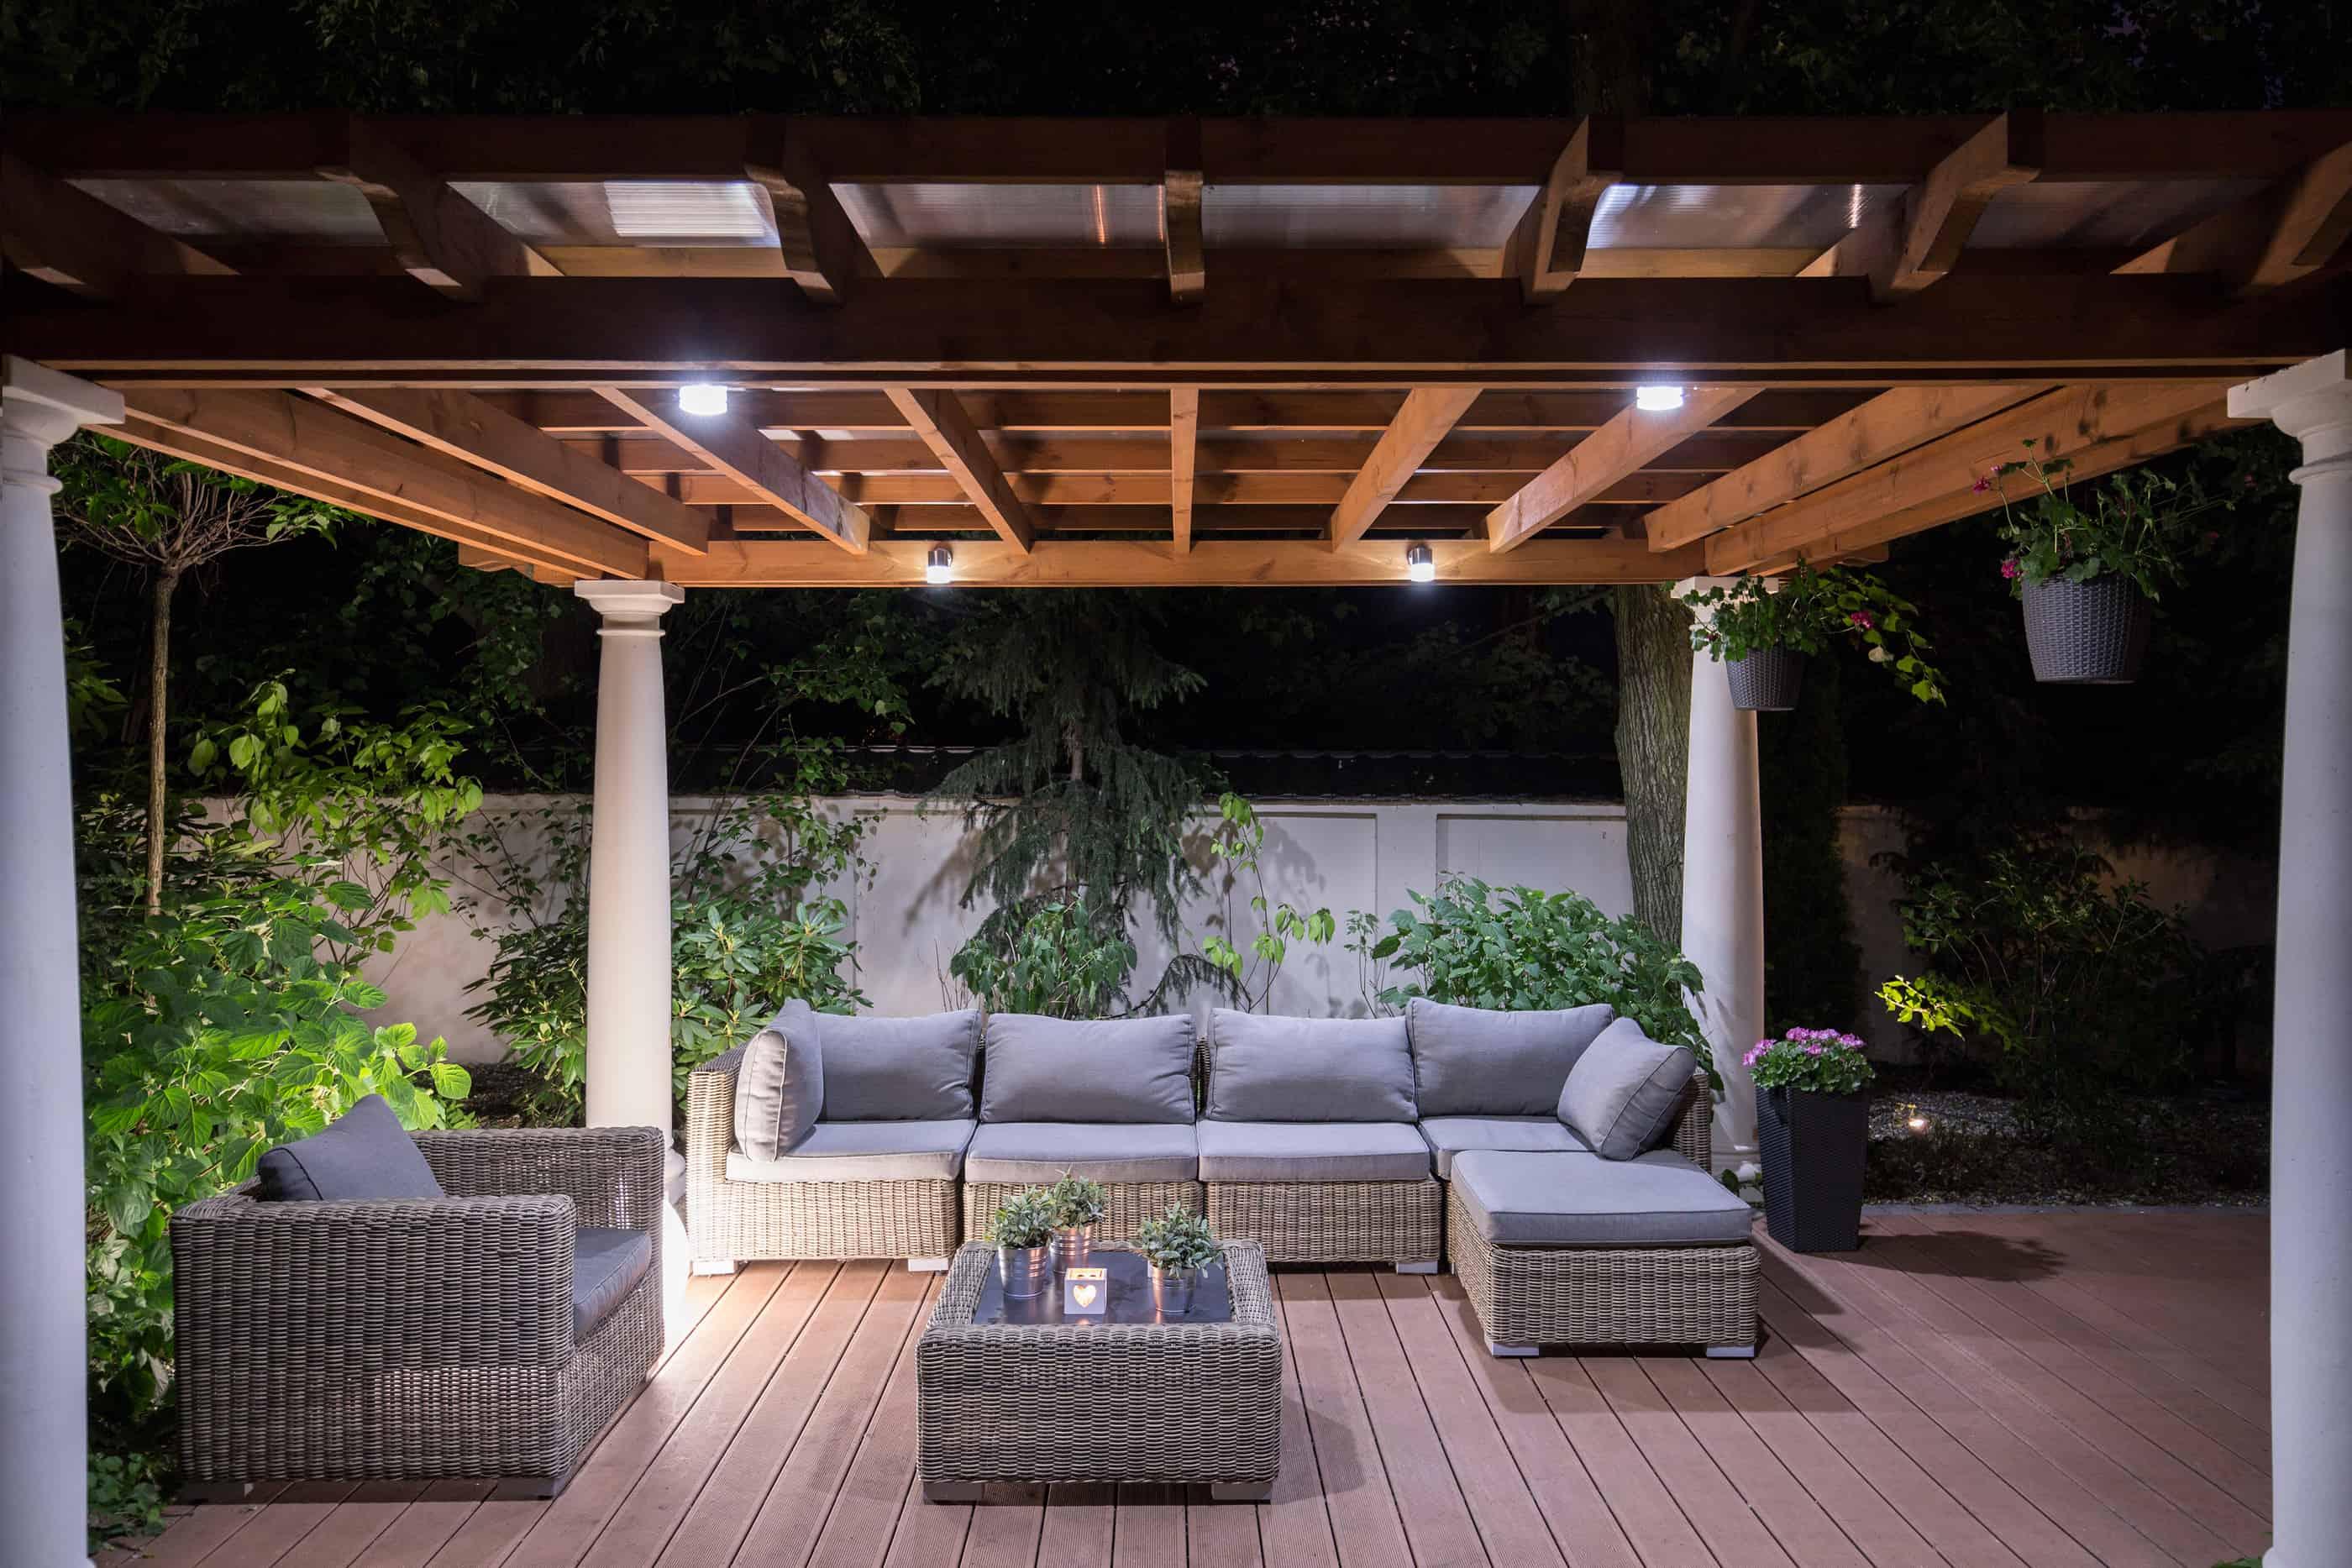 Artificial Grass LifeStyle Furniture